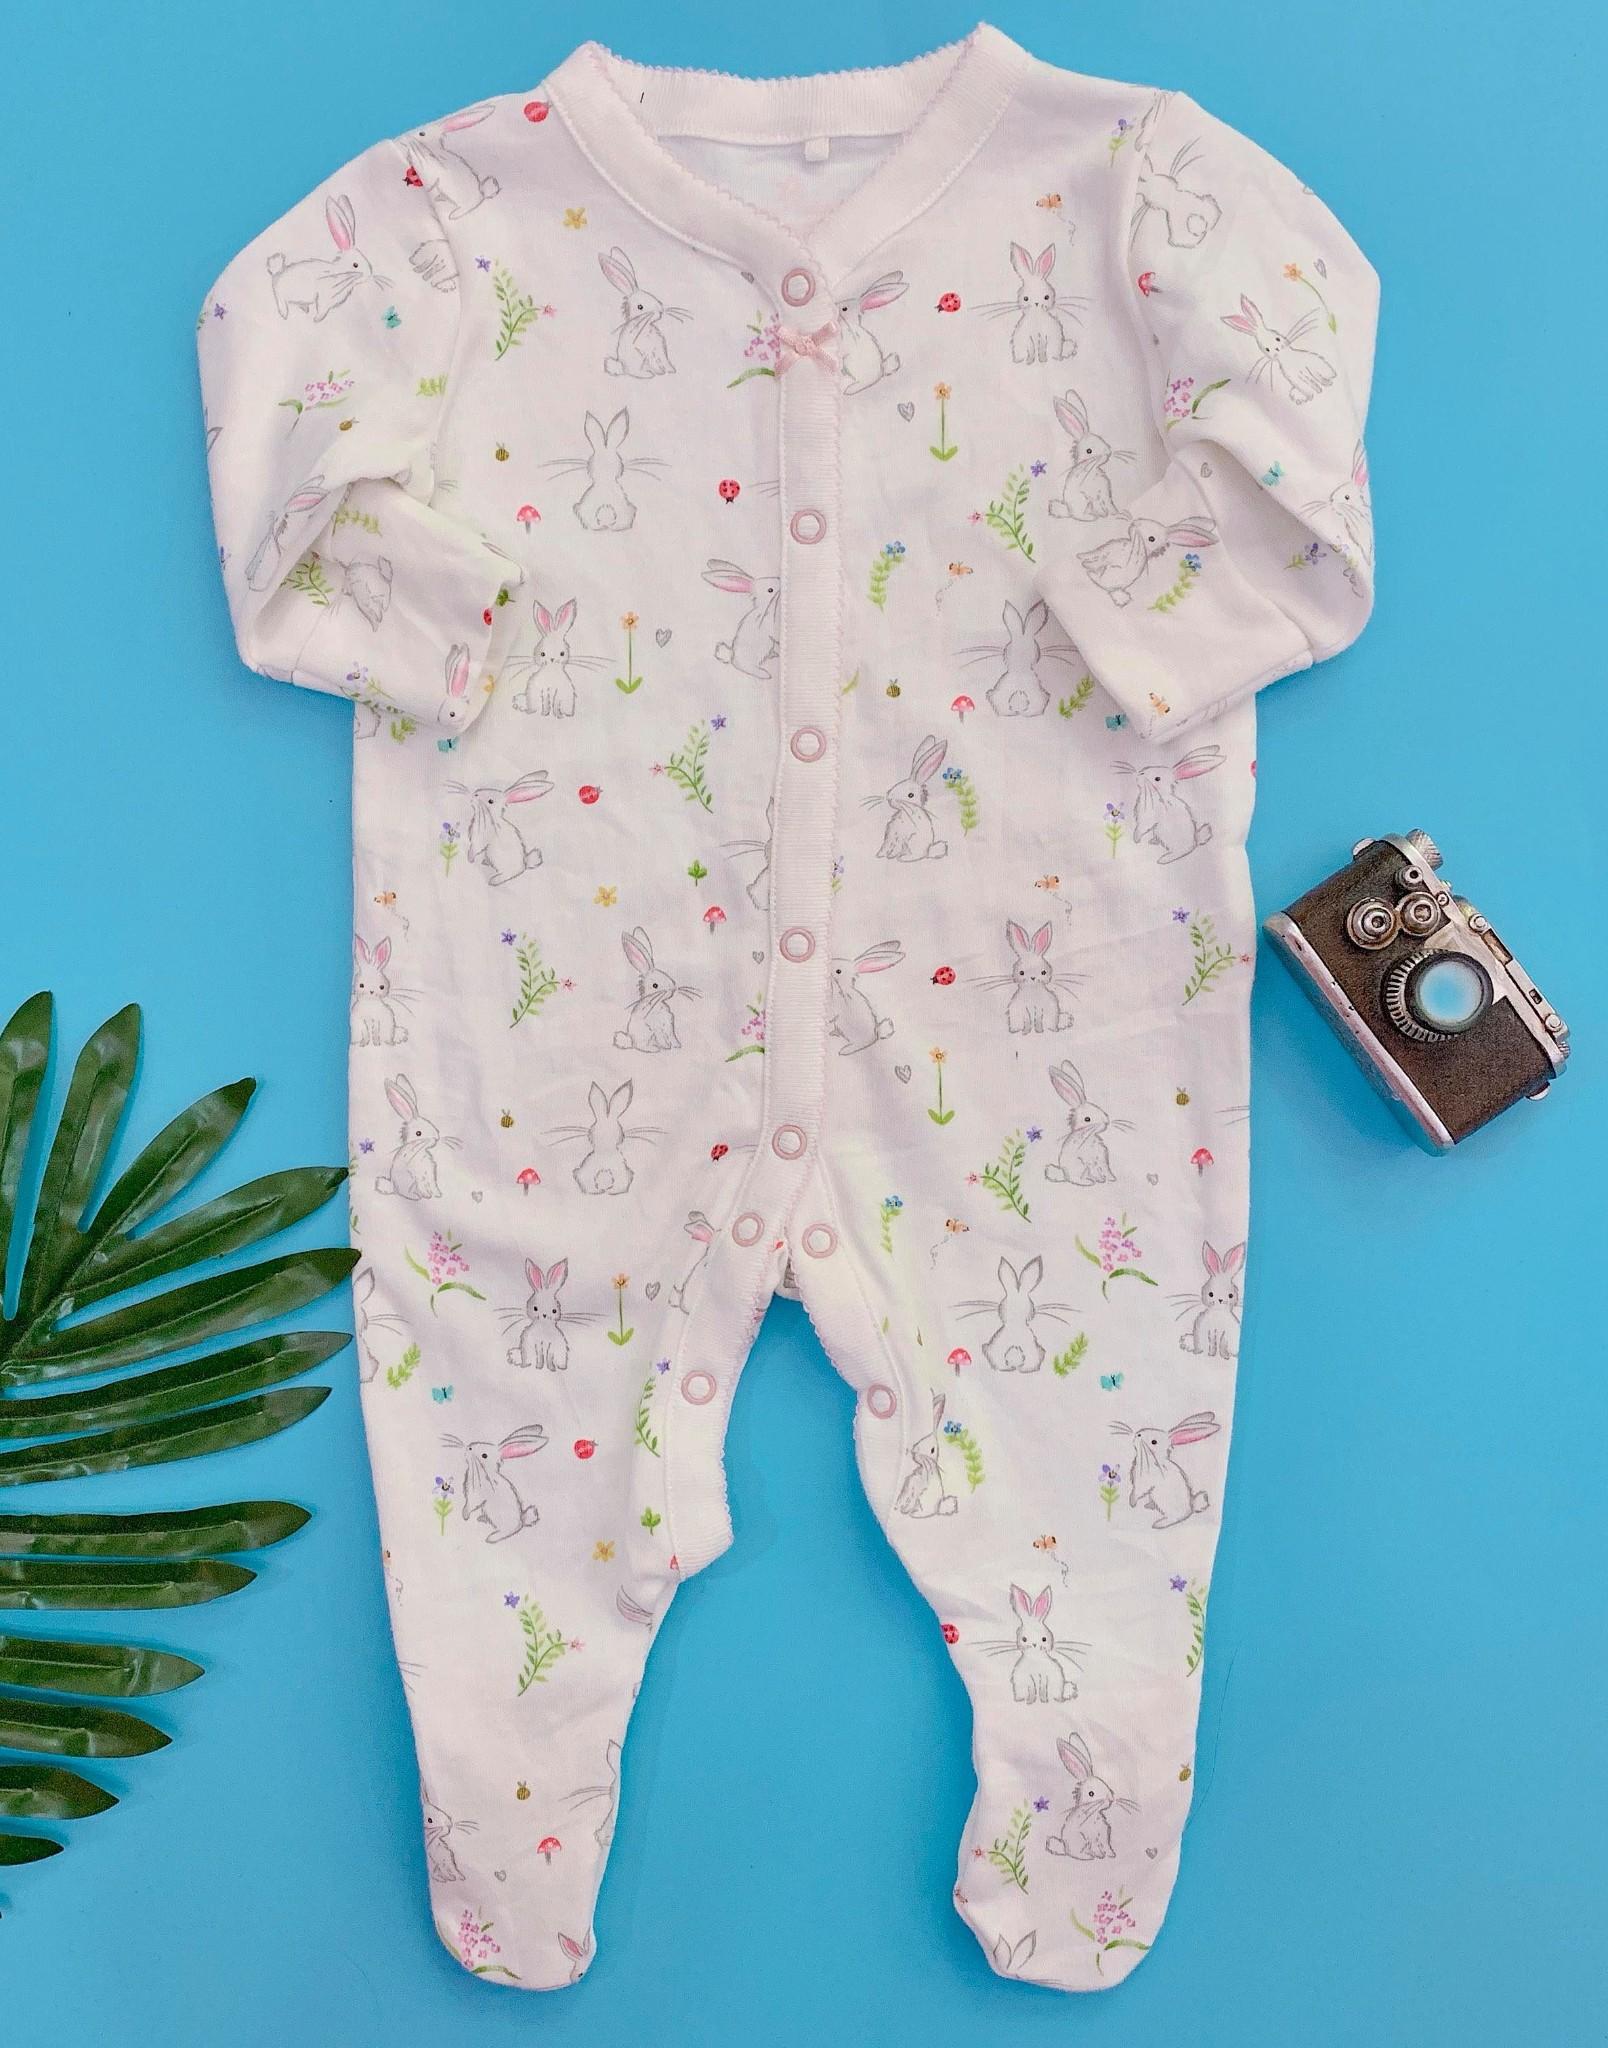 [4-7kg] Sleepsuit Next Baby 73 [Girl] - Trắng/Thỏ Nấm